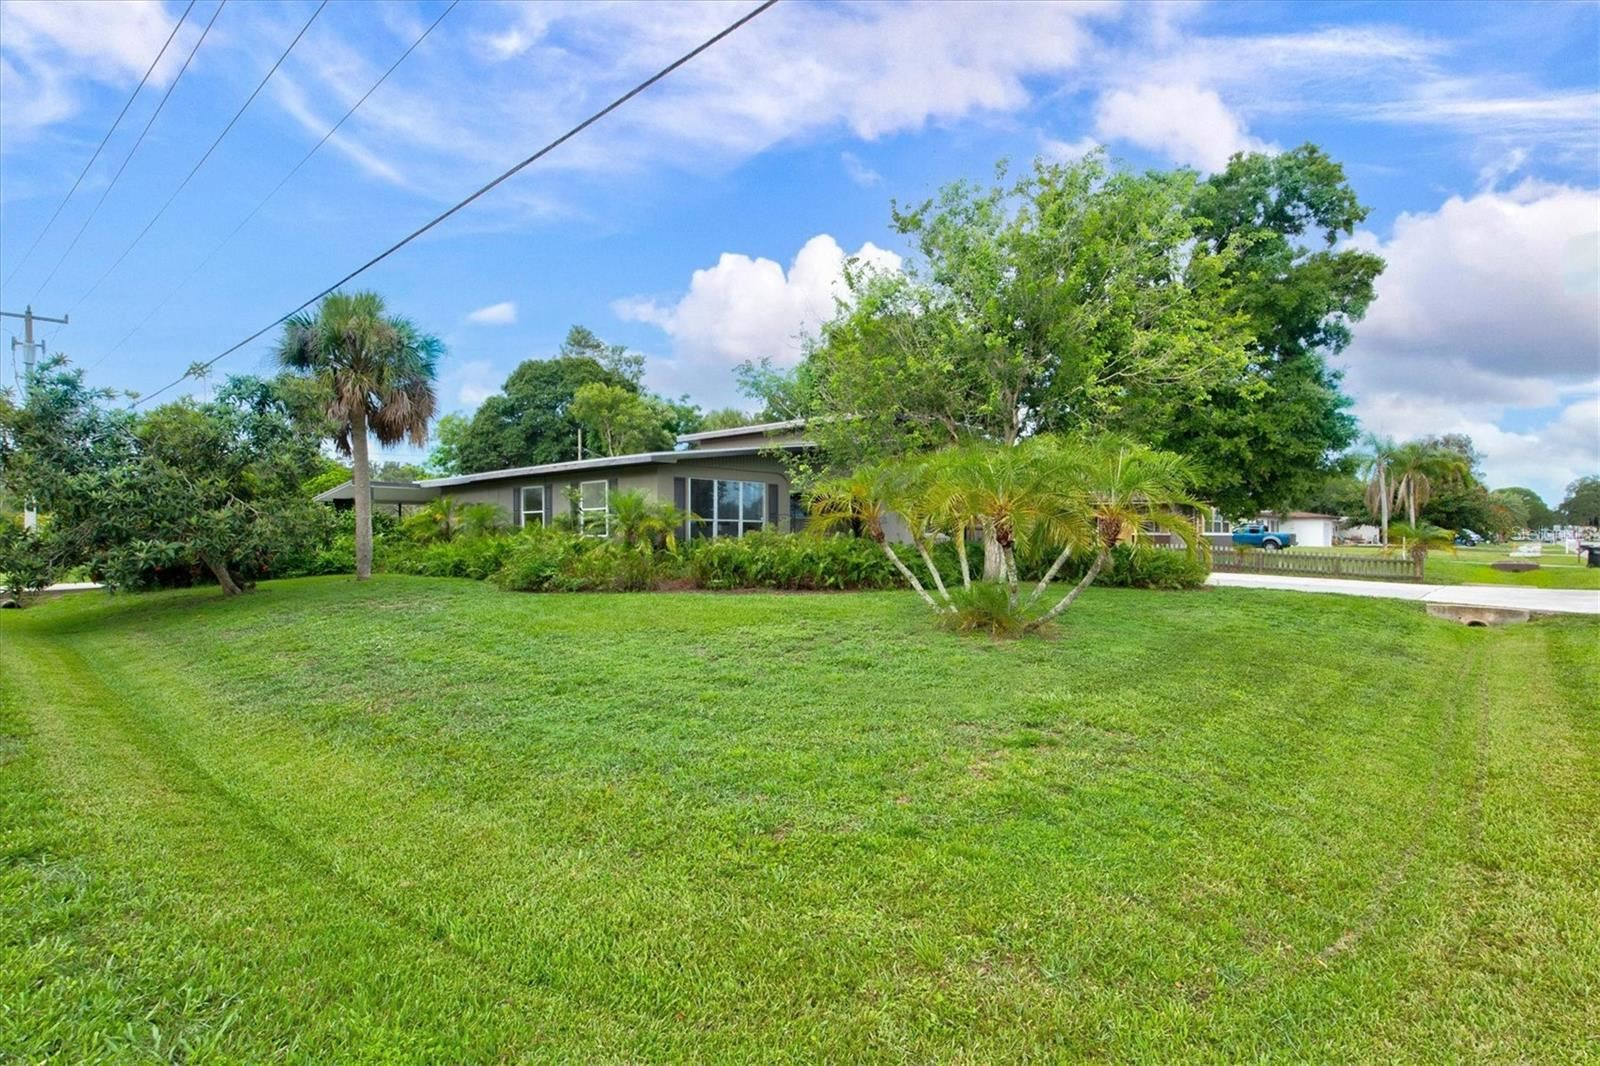 Photo of 836 CYPRESS AVENUE, VENICE, FL 34285 (MLS # N6116415)